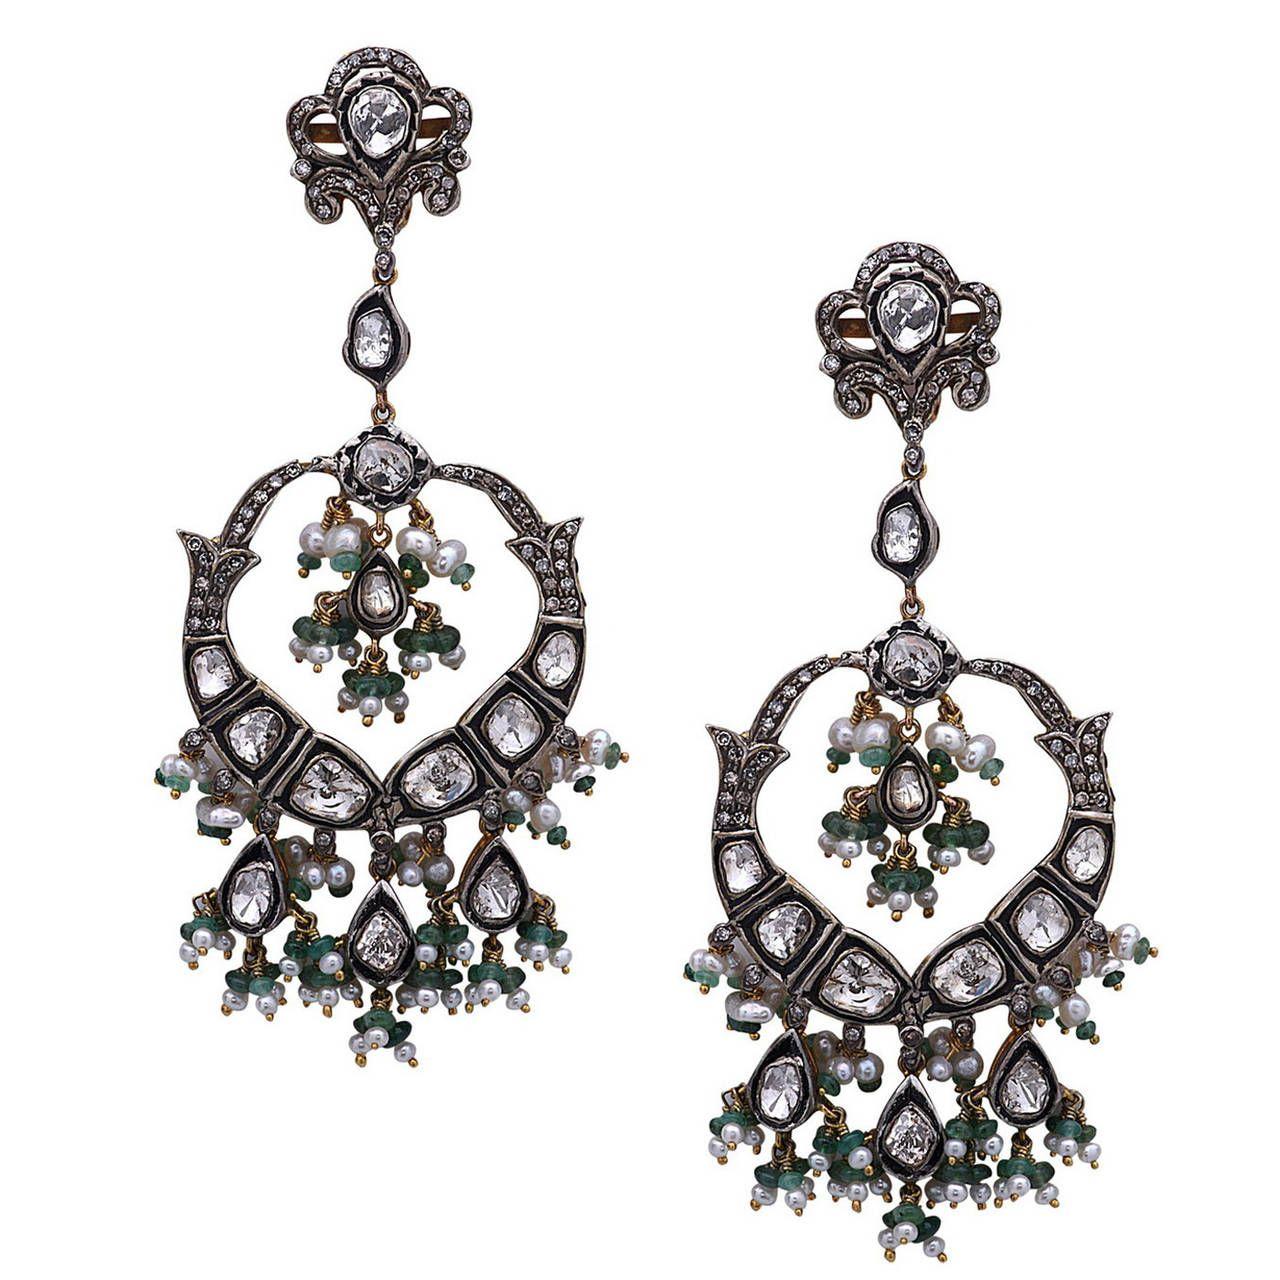 Stunning pearl emerald rose cut diamond chandelier earrings stunning pearl emerald rose cut diamond chandelier earrings mozeypictures Image collections